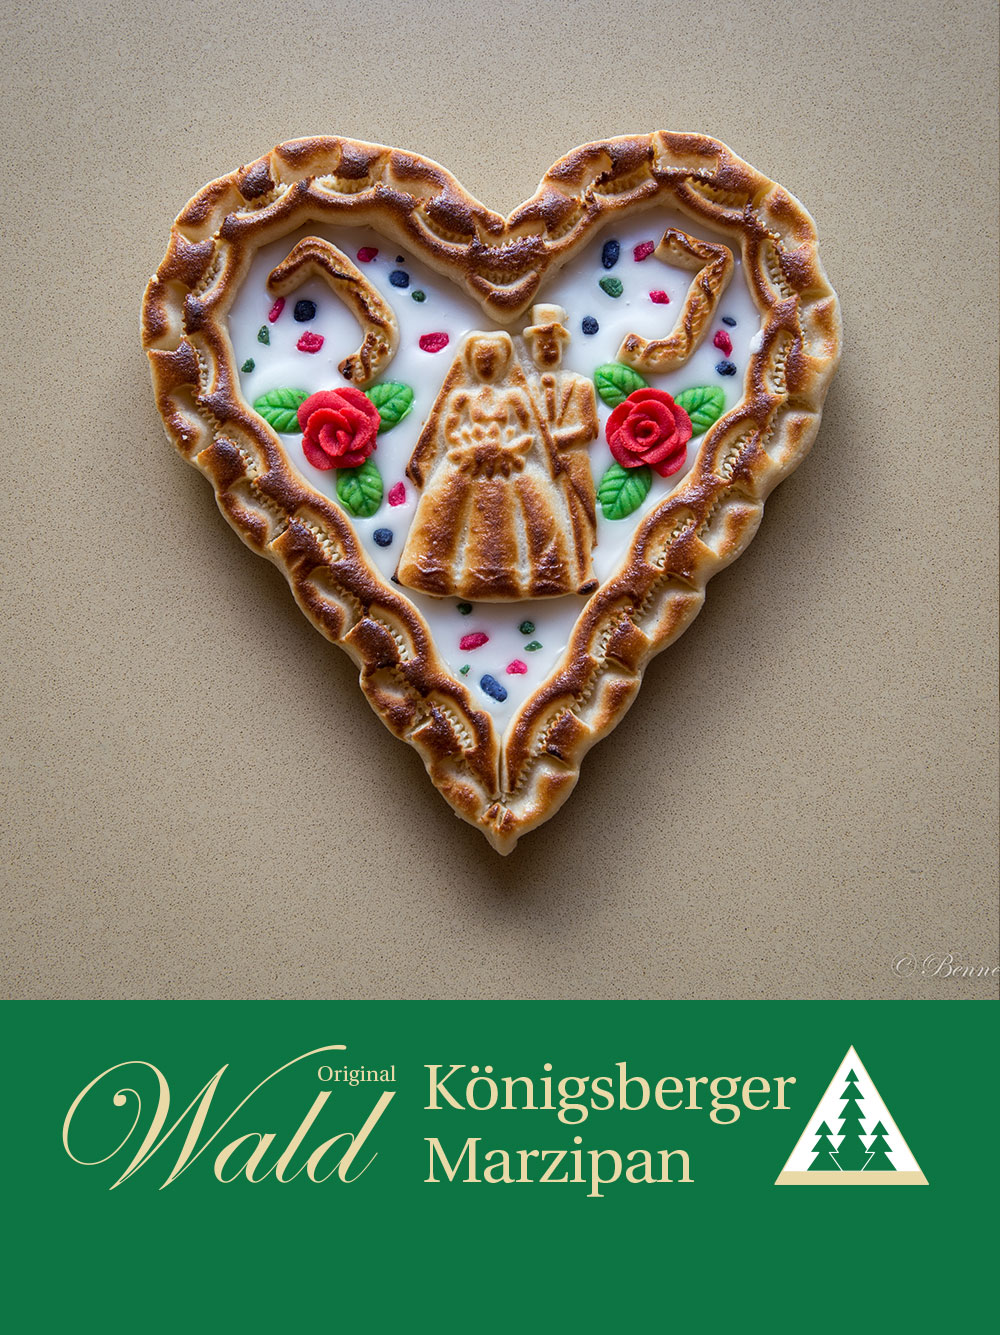 Original Wald Königsberger Marzipanherzen Hochzeit 380g